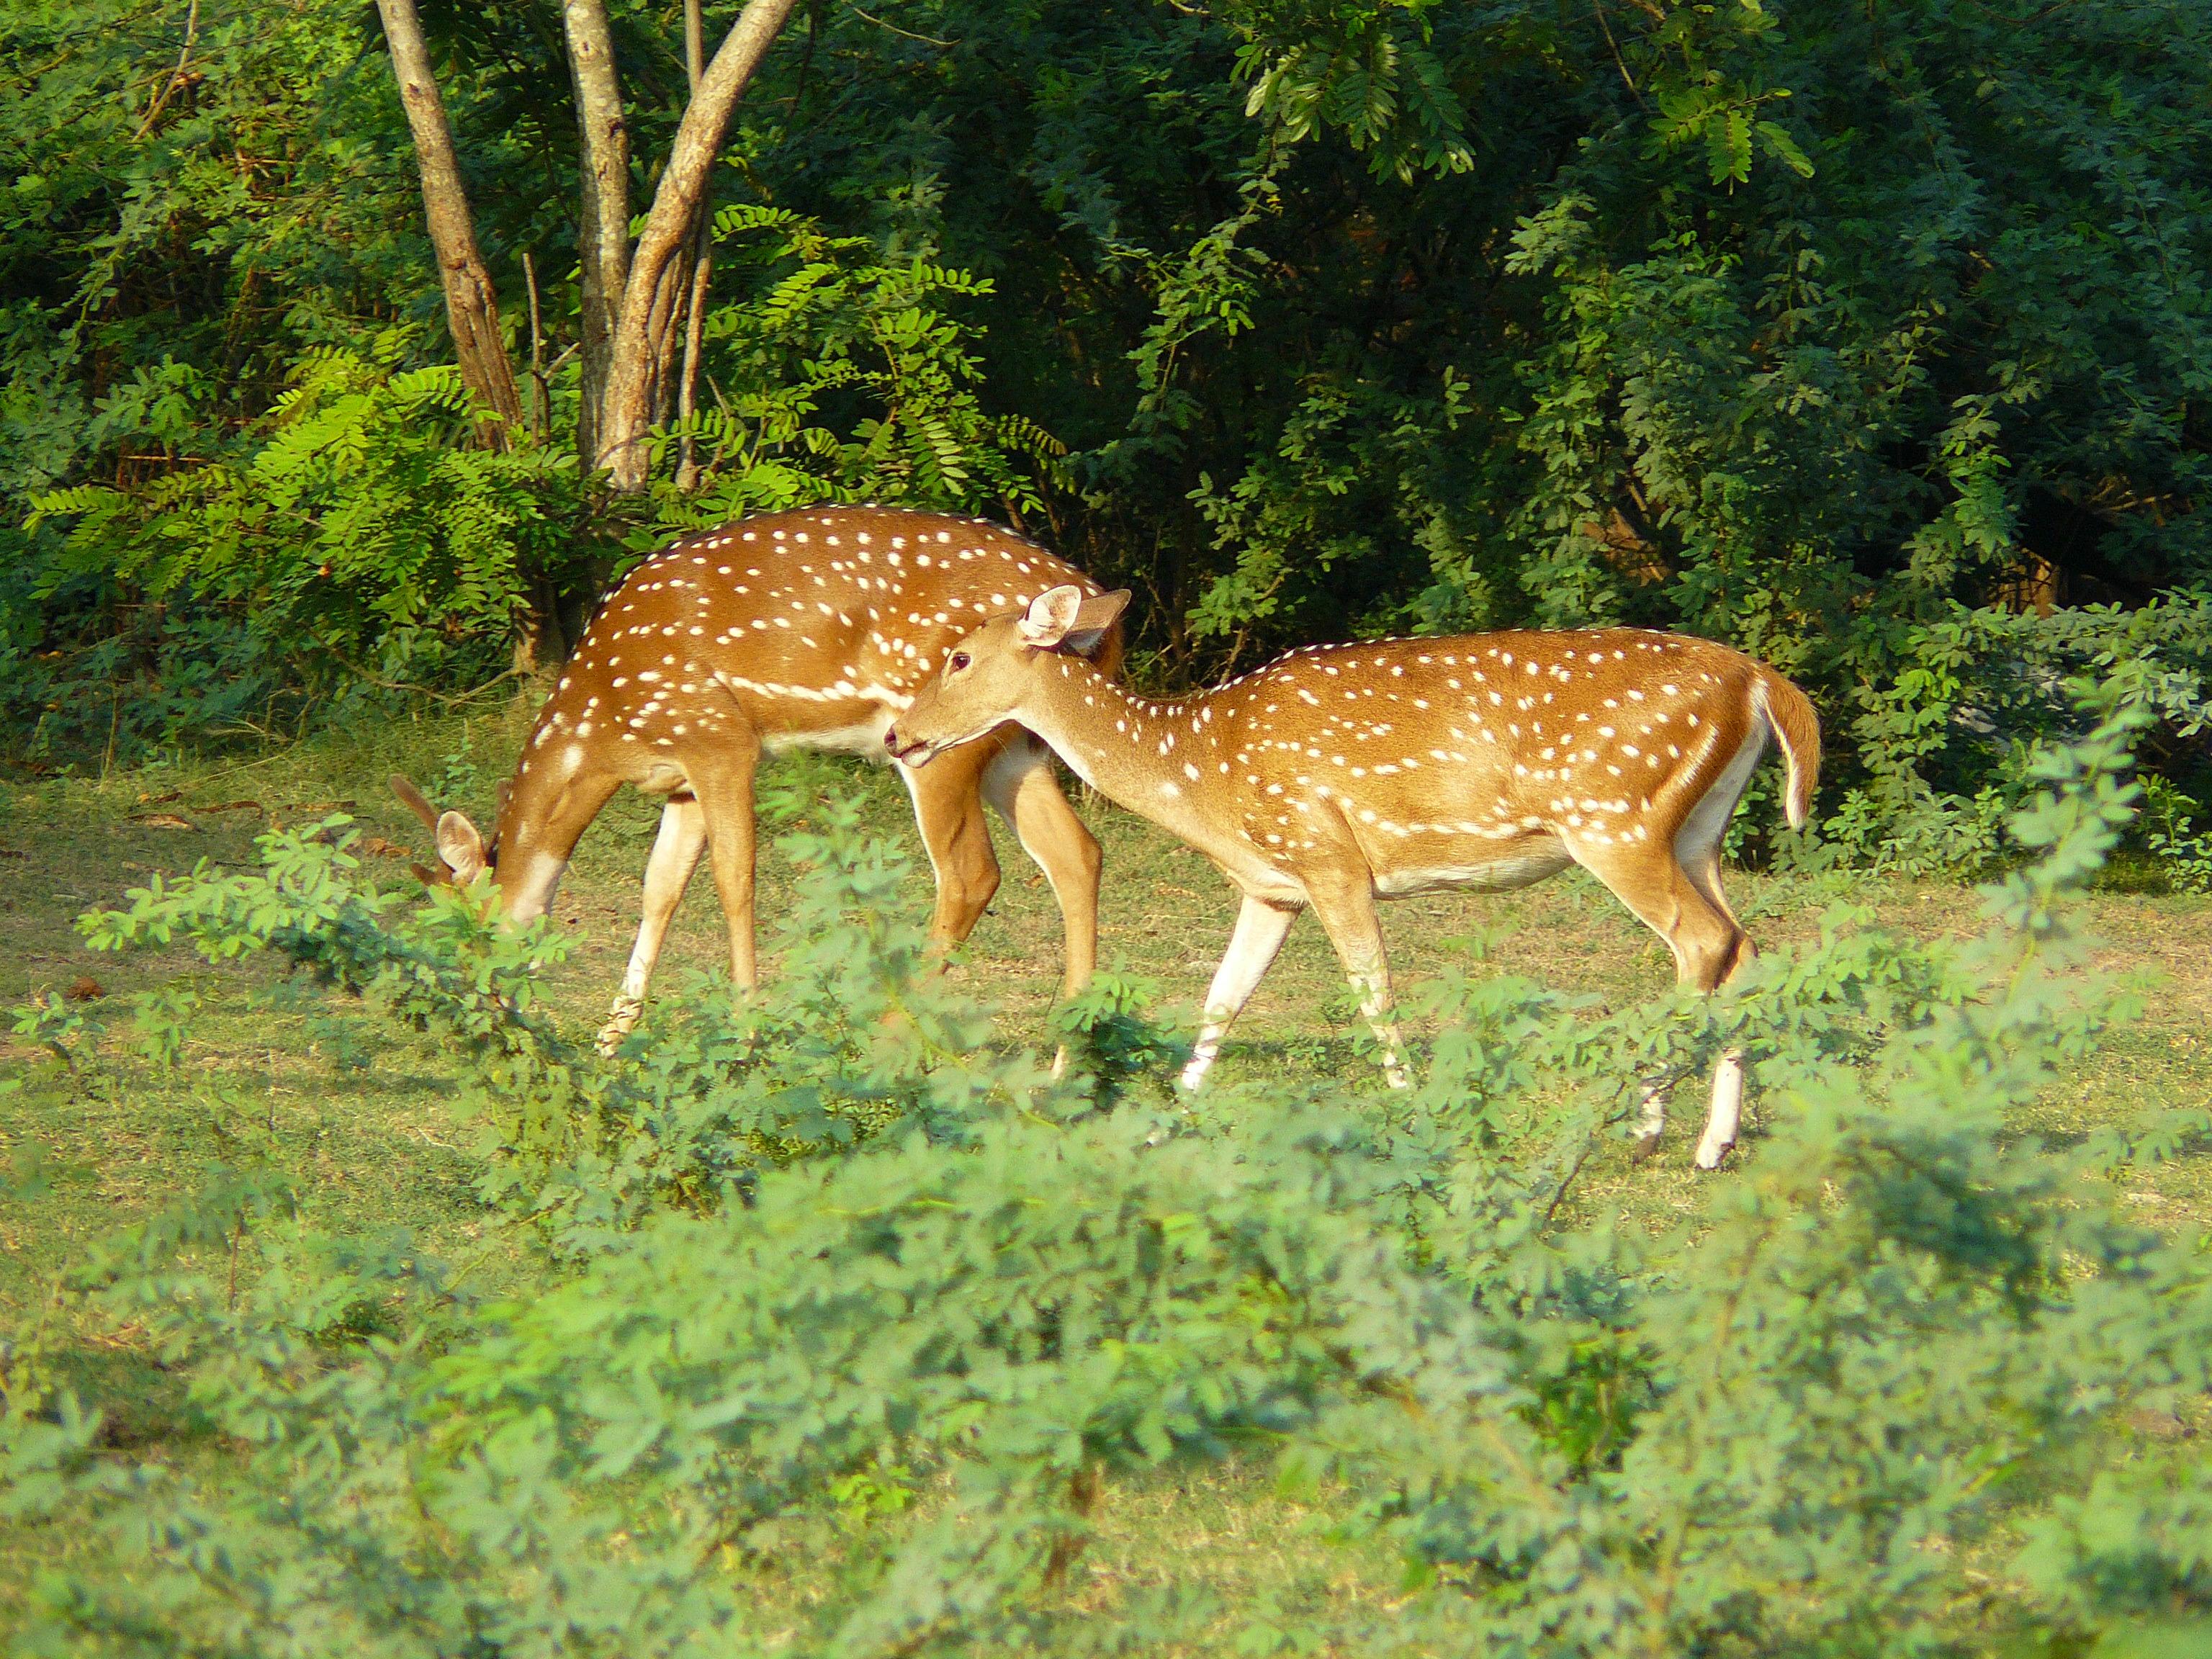 IIT Madras Wikipedia: File:Deer Of IIT Madras Masatran 0058 0010.jpeg